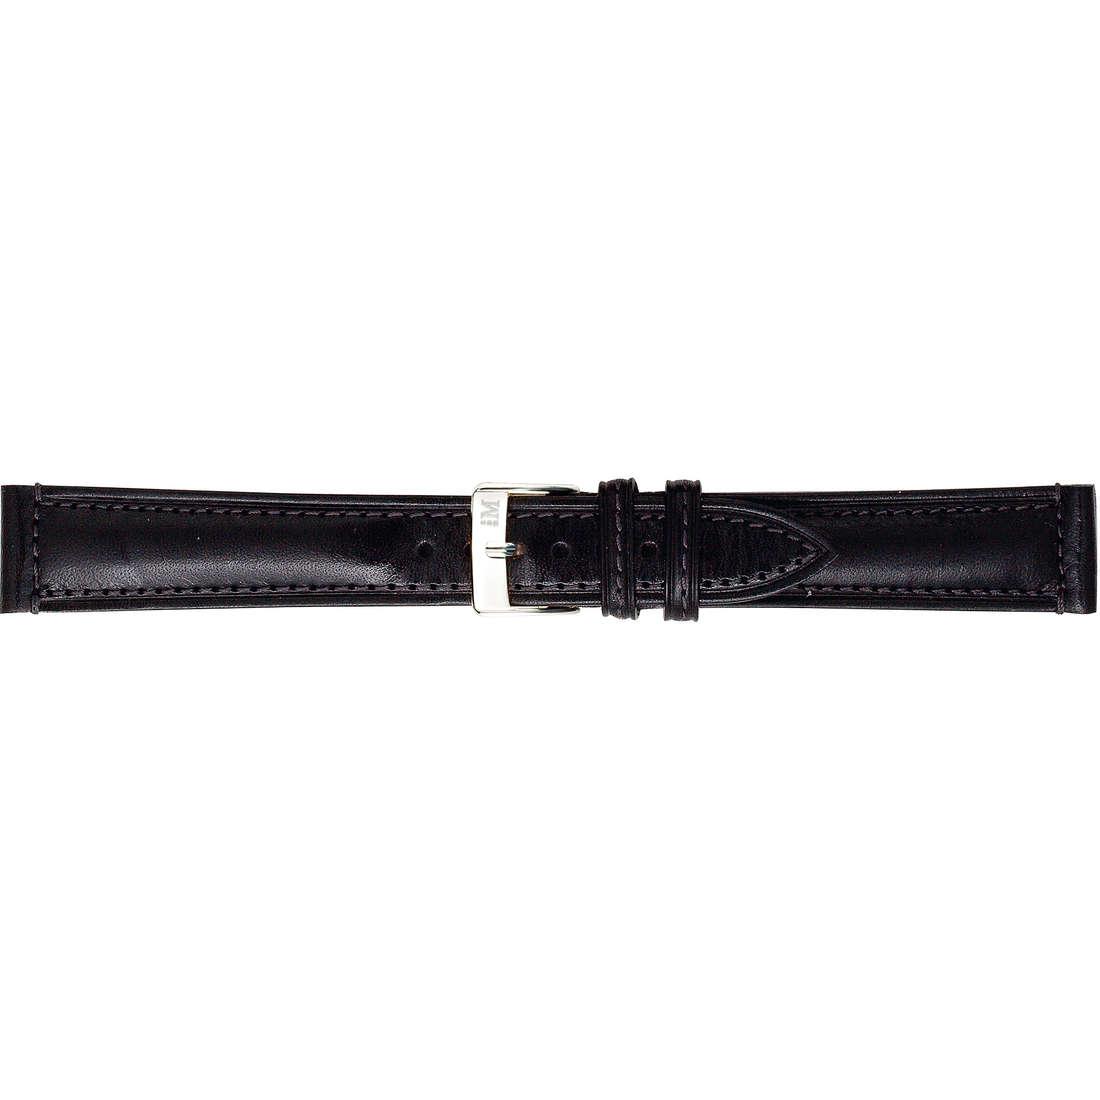 watch watch bands watch straps man Morellato Manufatti A01U0895403019CR18